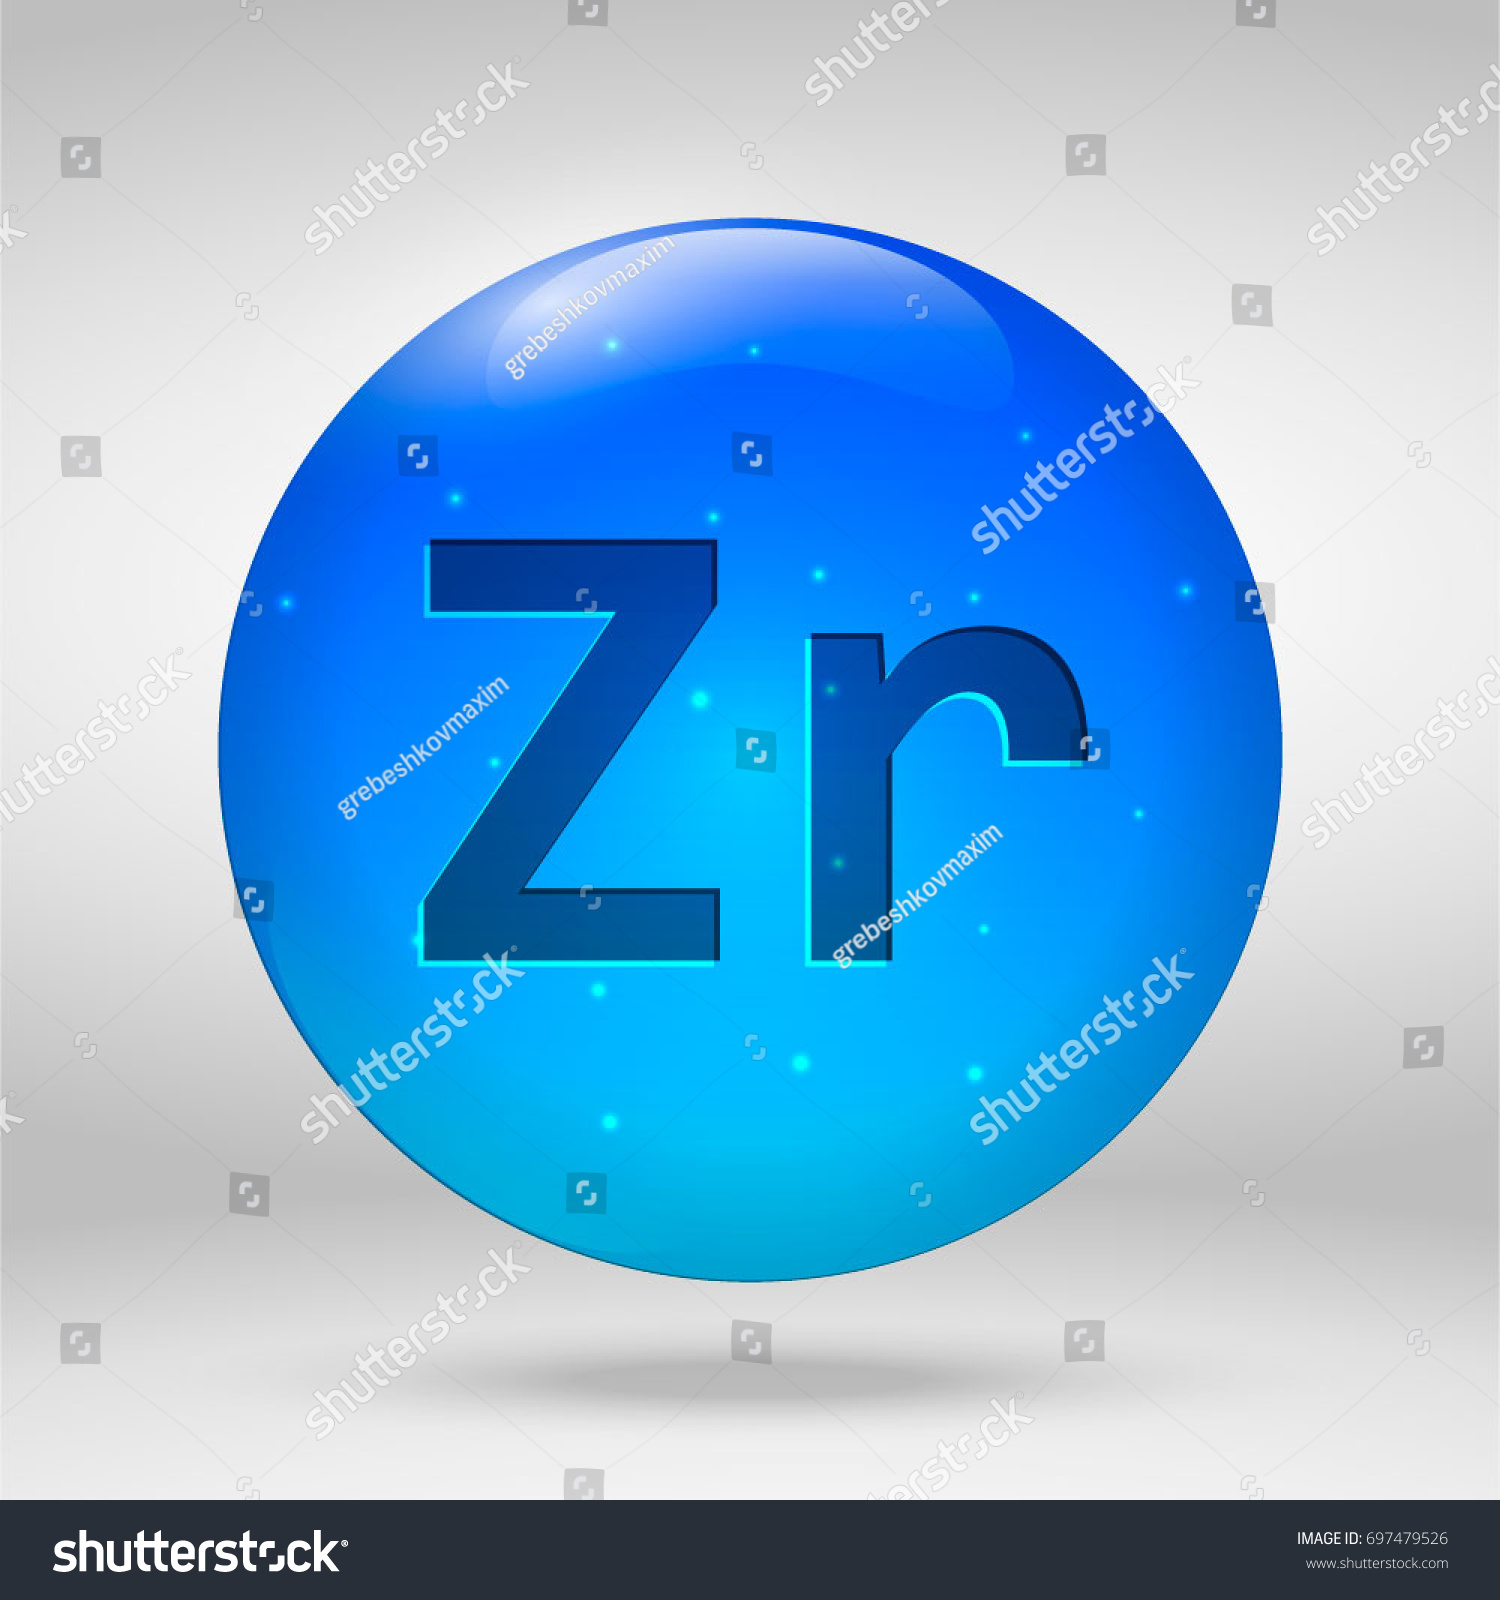 Zirconium symbol periodic table gallery periodic table images zirconium element periodic table vector 3d stock vector 697479526 zirconium element of the periodic table vector gamestrikefo Images